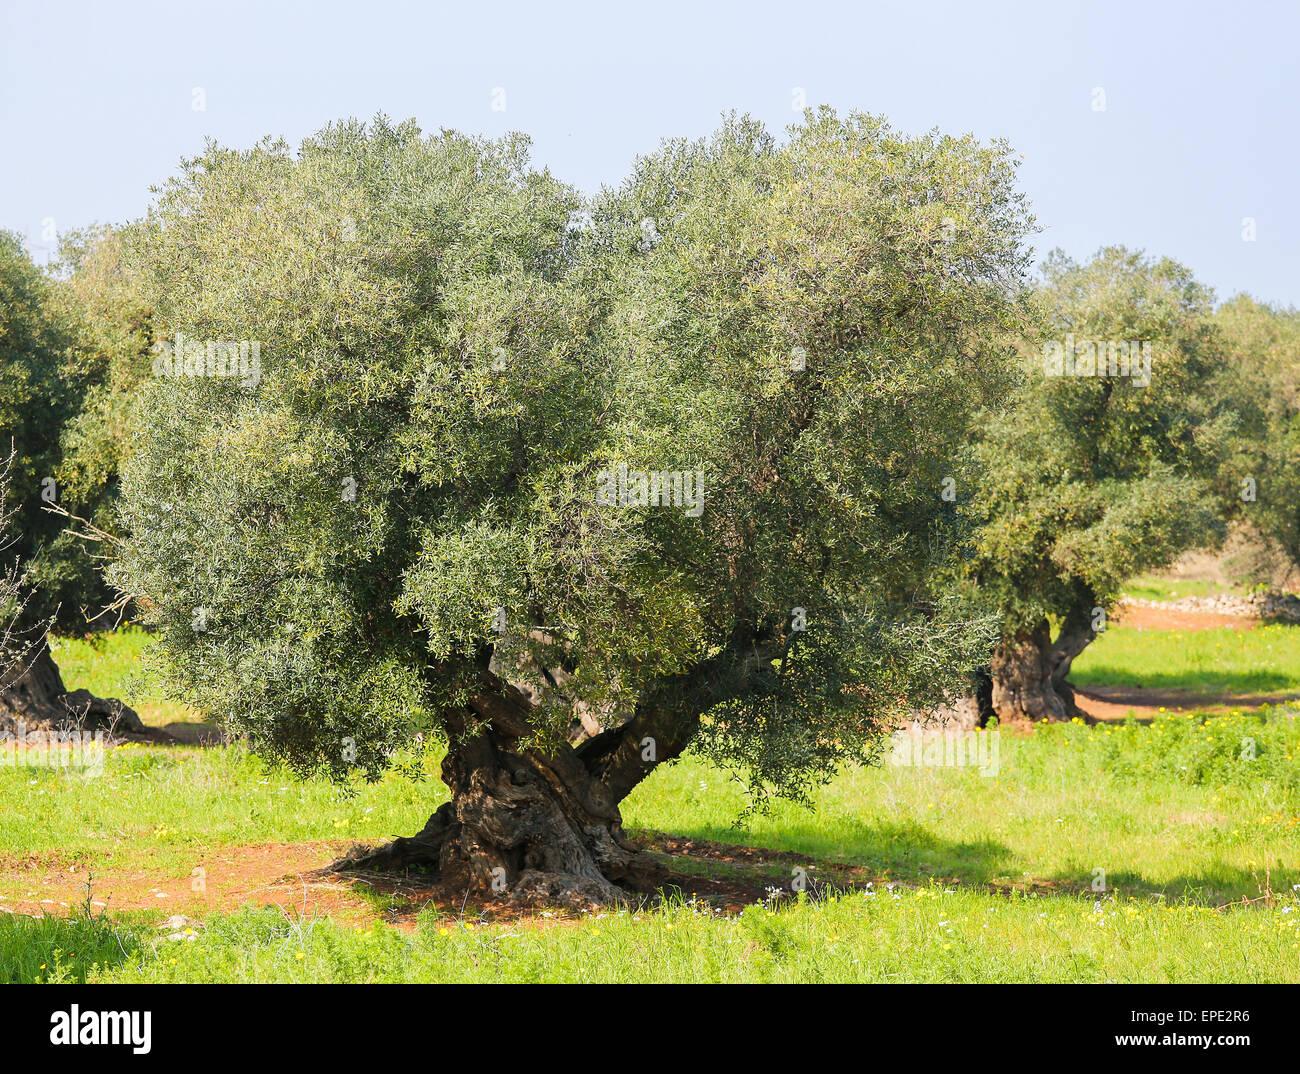 Olive Garden Stock Photos & Olive Garden Stock Images - Alamy